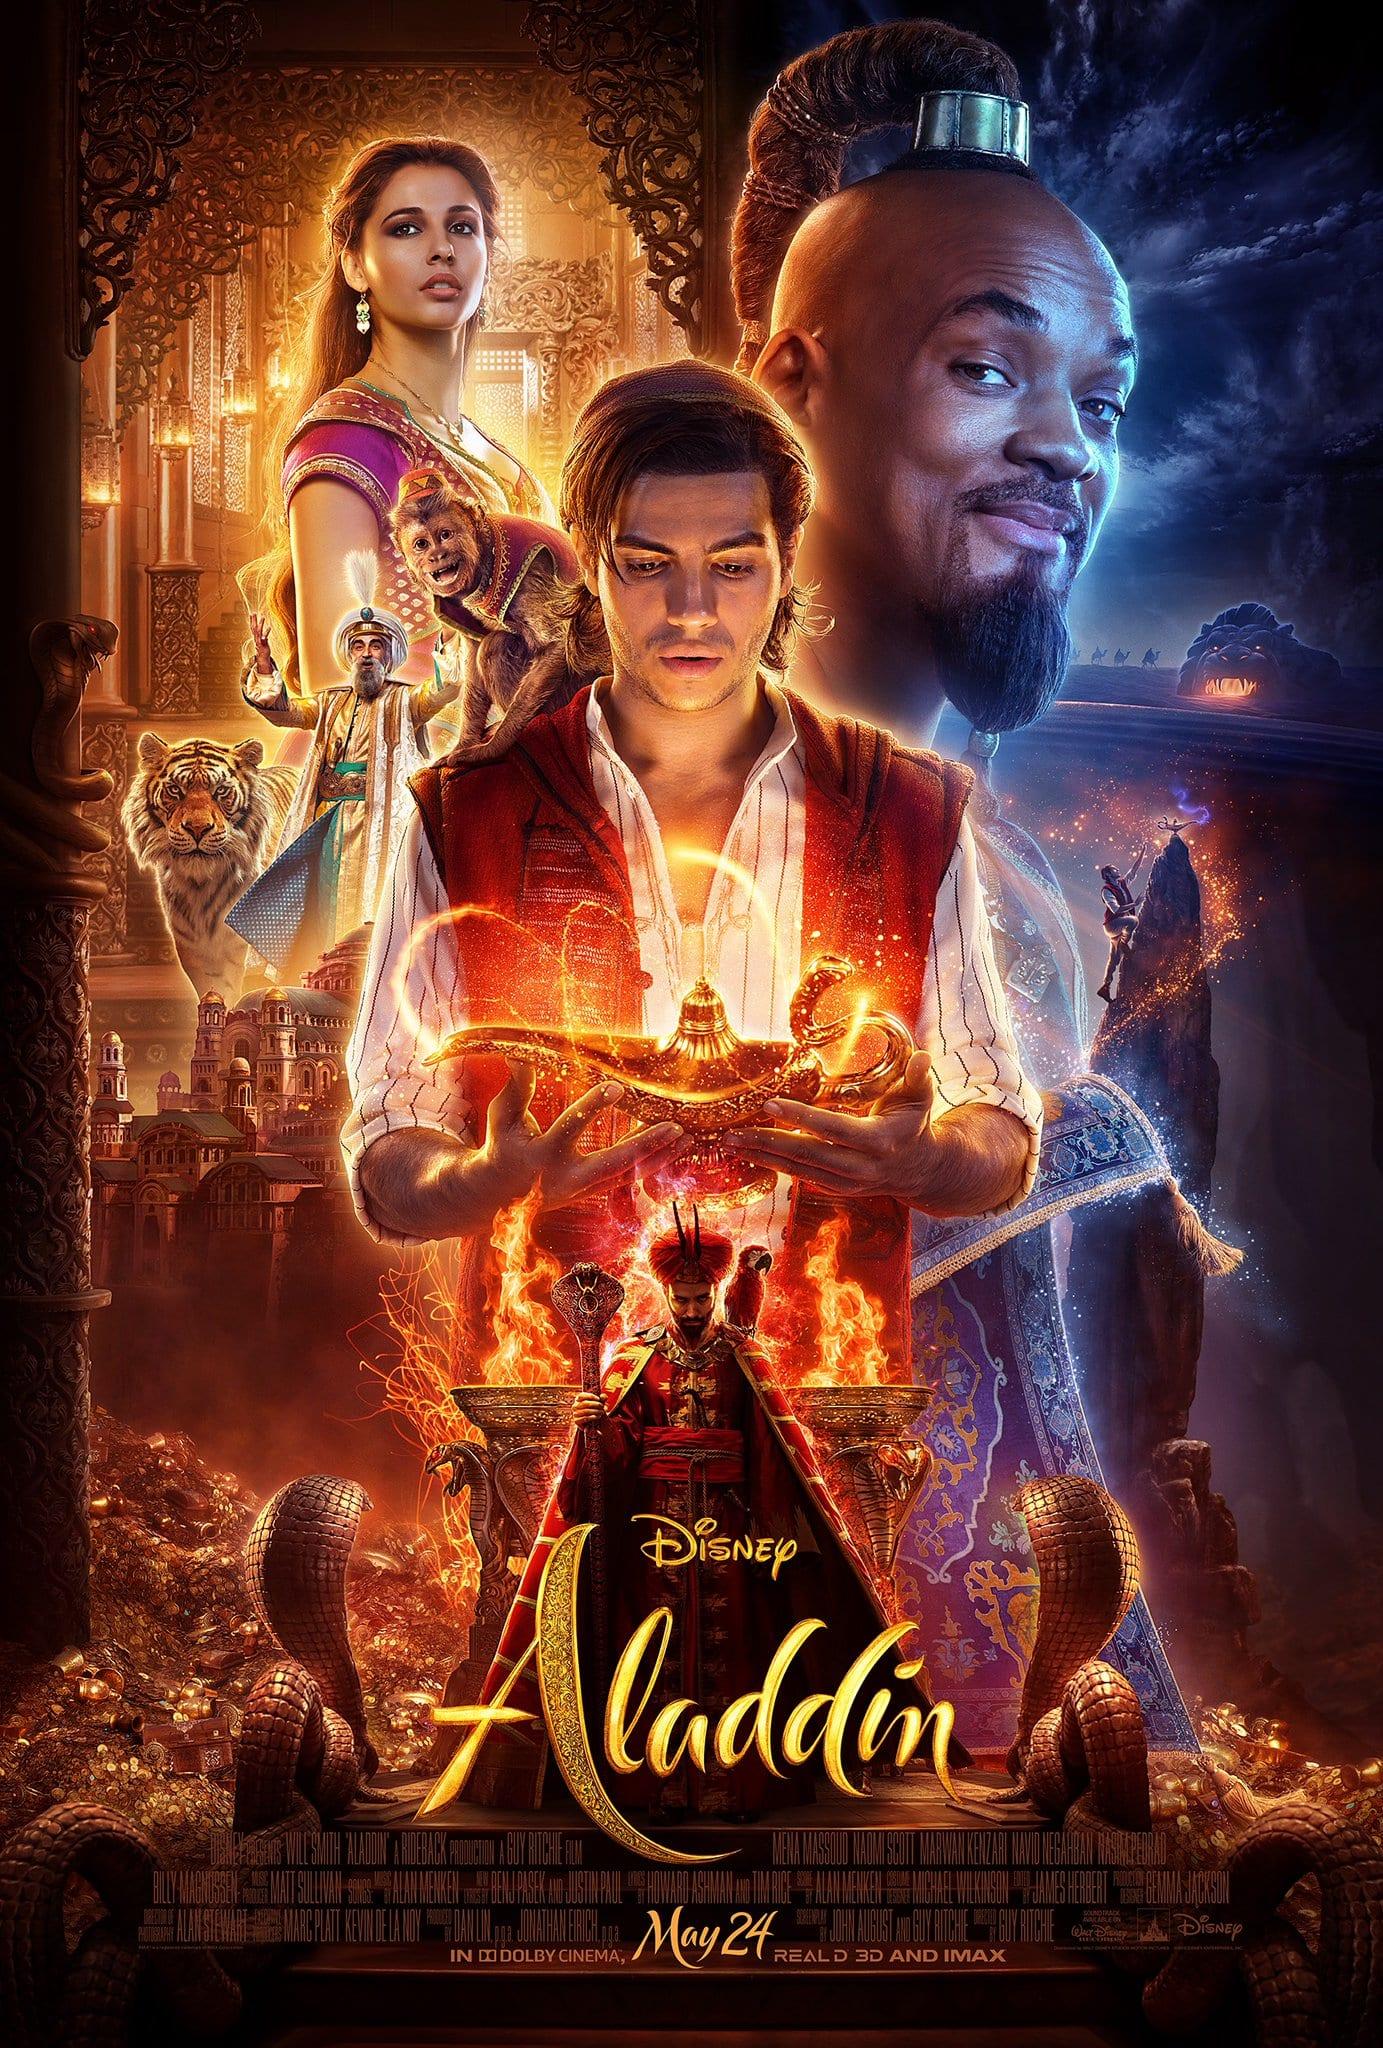 Disney's Live-Action Aladdin Brand New Poster